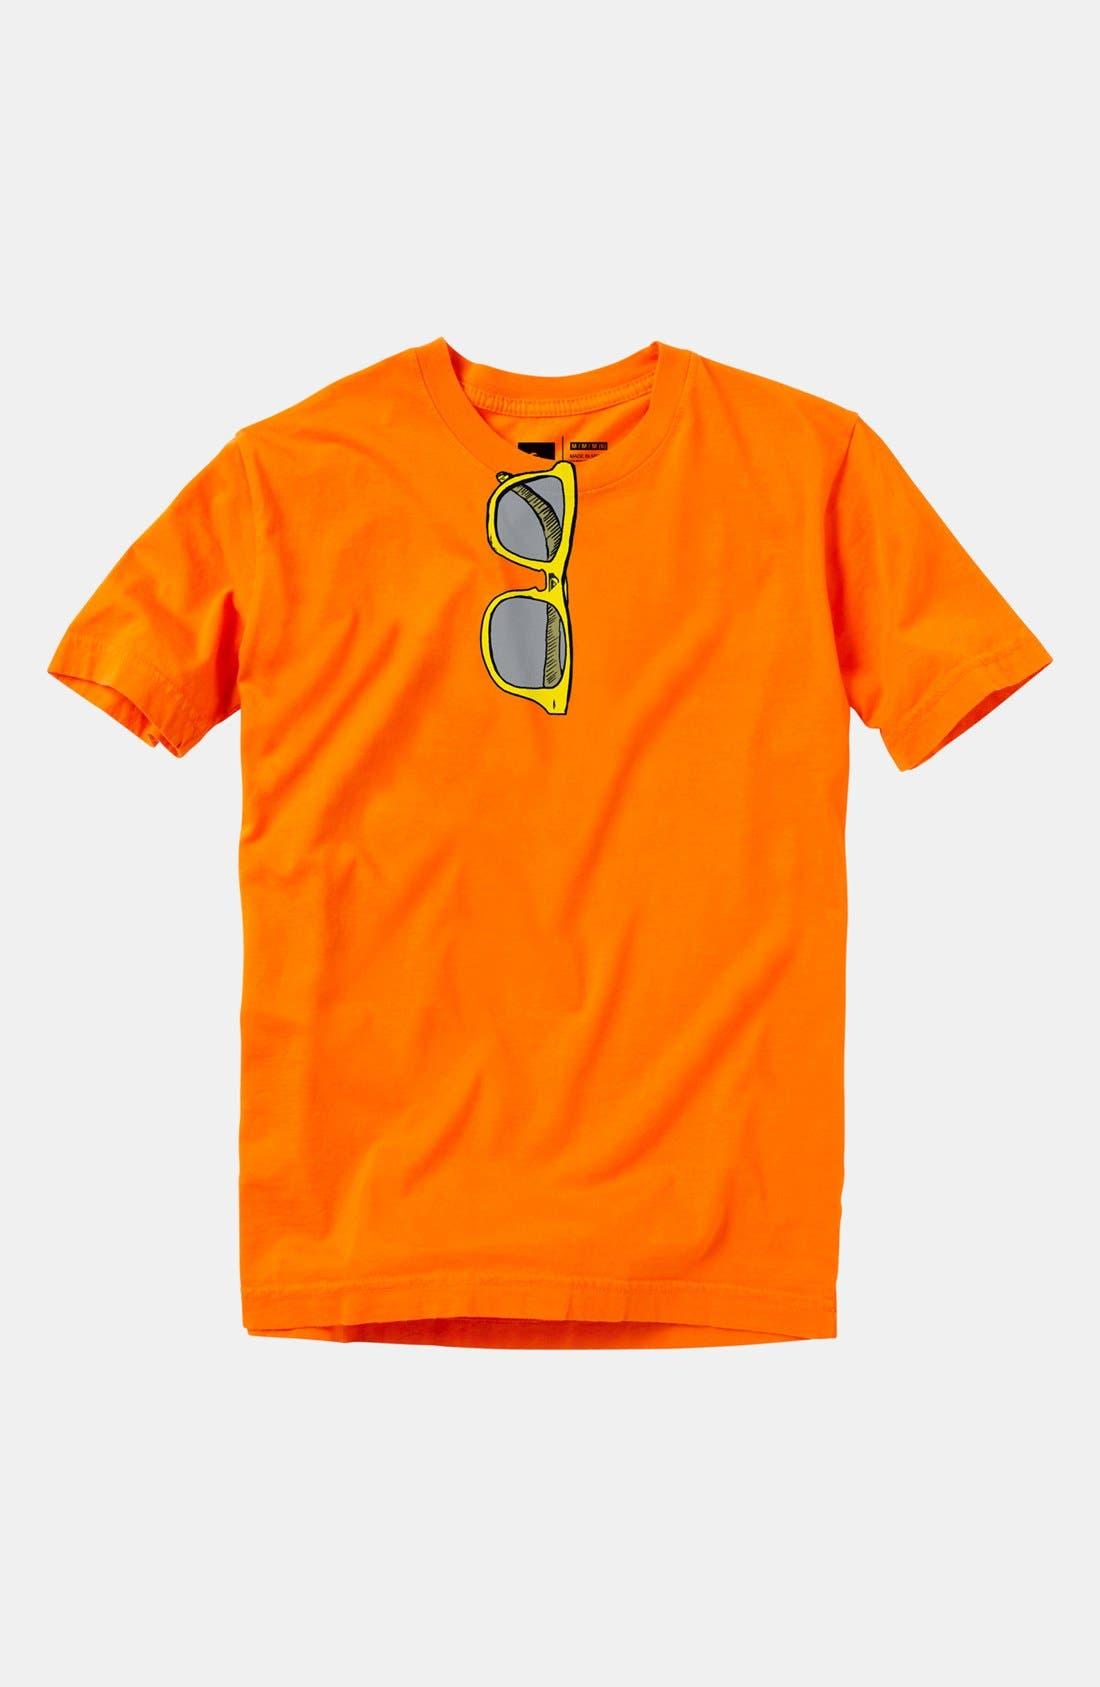 Alternate Image 1 Selected - Quiksilver 'Specs' T-Shirt (Little Boys)